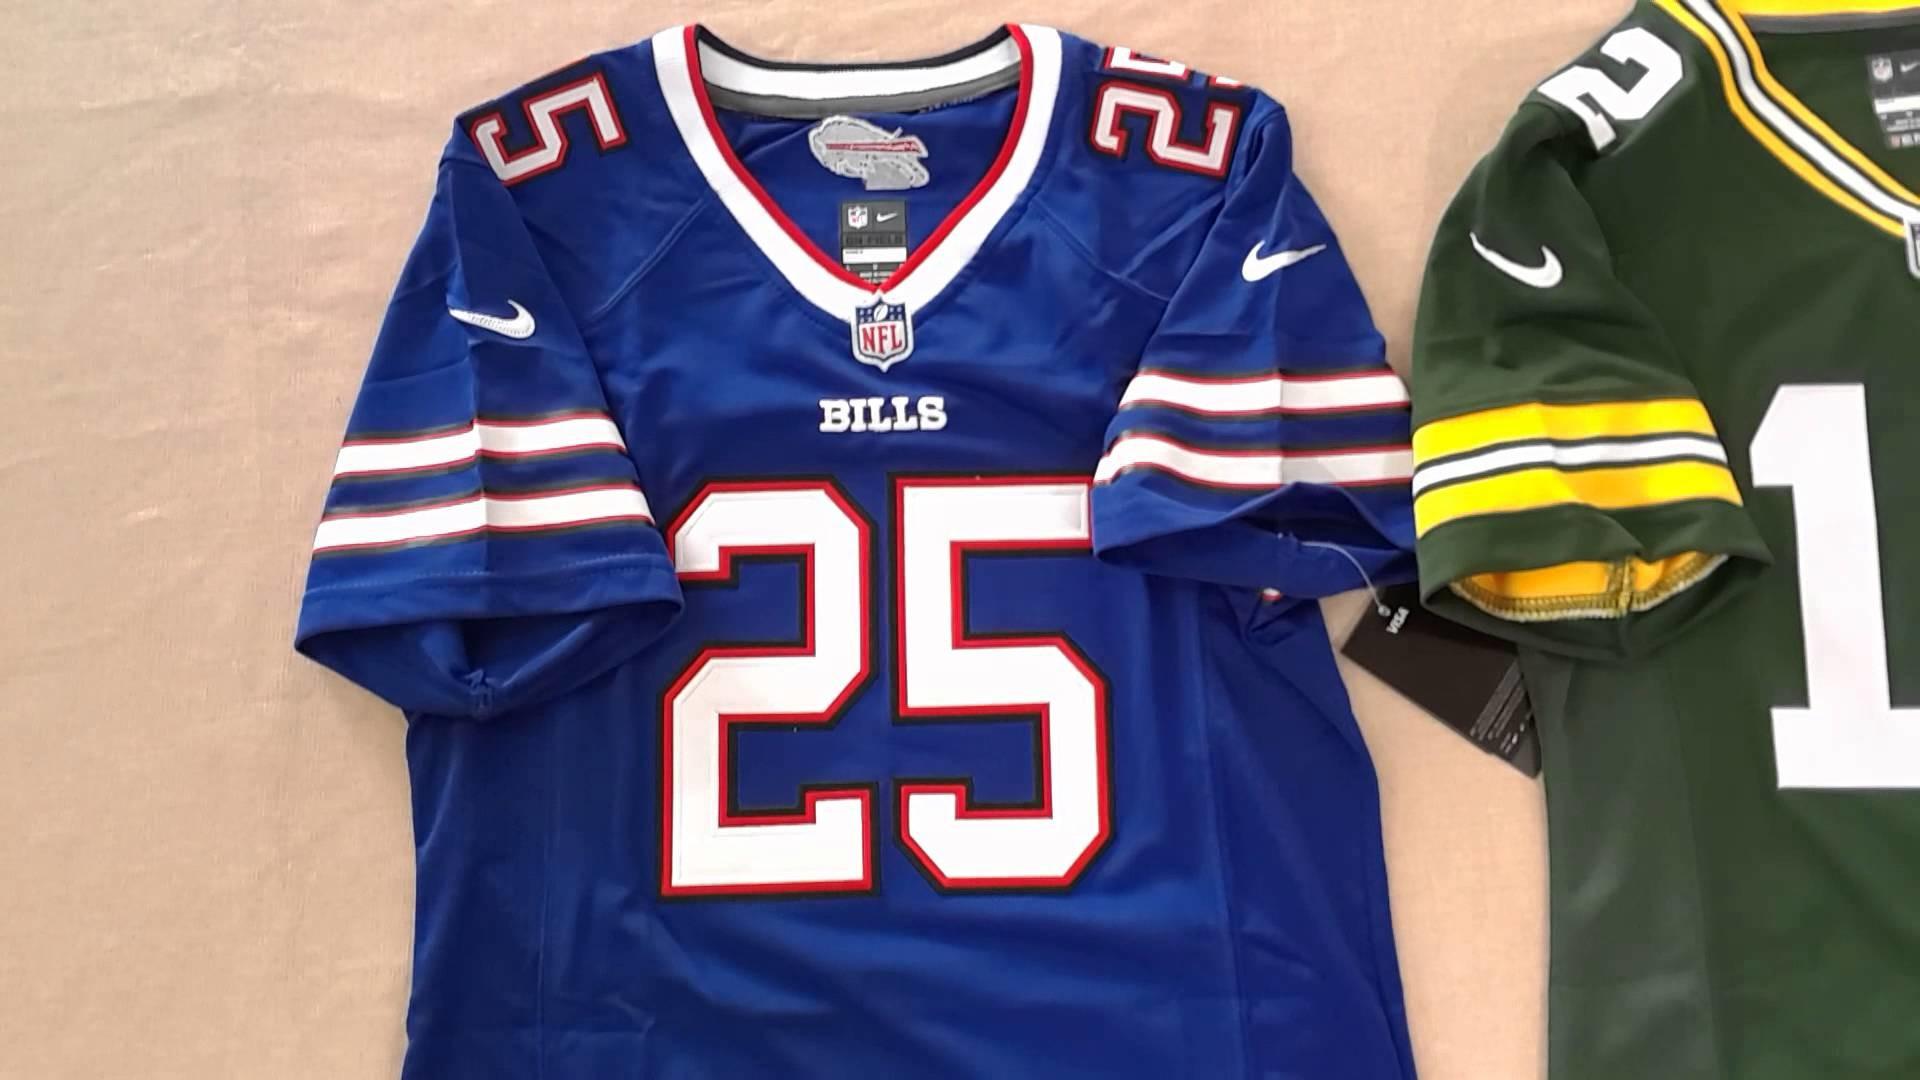 Raiders #4 Derek Carr, Titans #8 Marcus Mariota, Bills #25 LeSean McCoy,Packers  #12 Aaron Rodgers